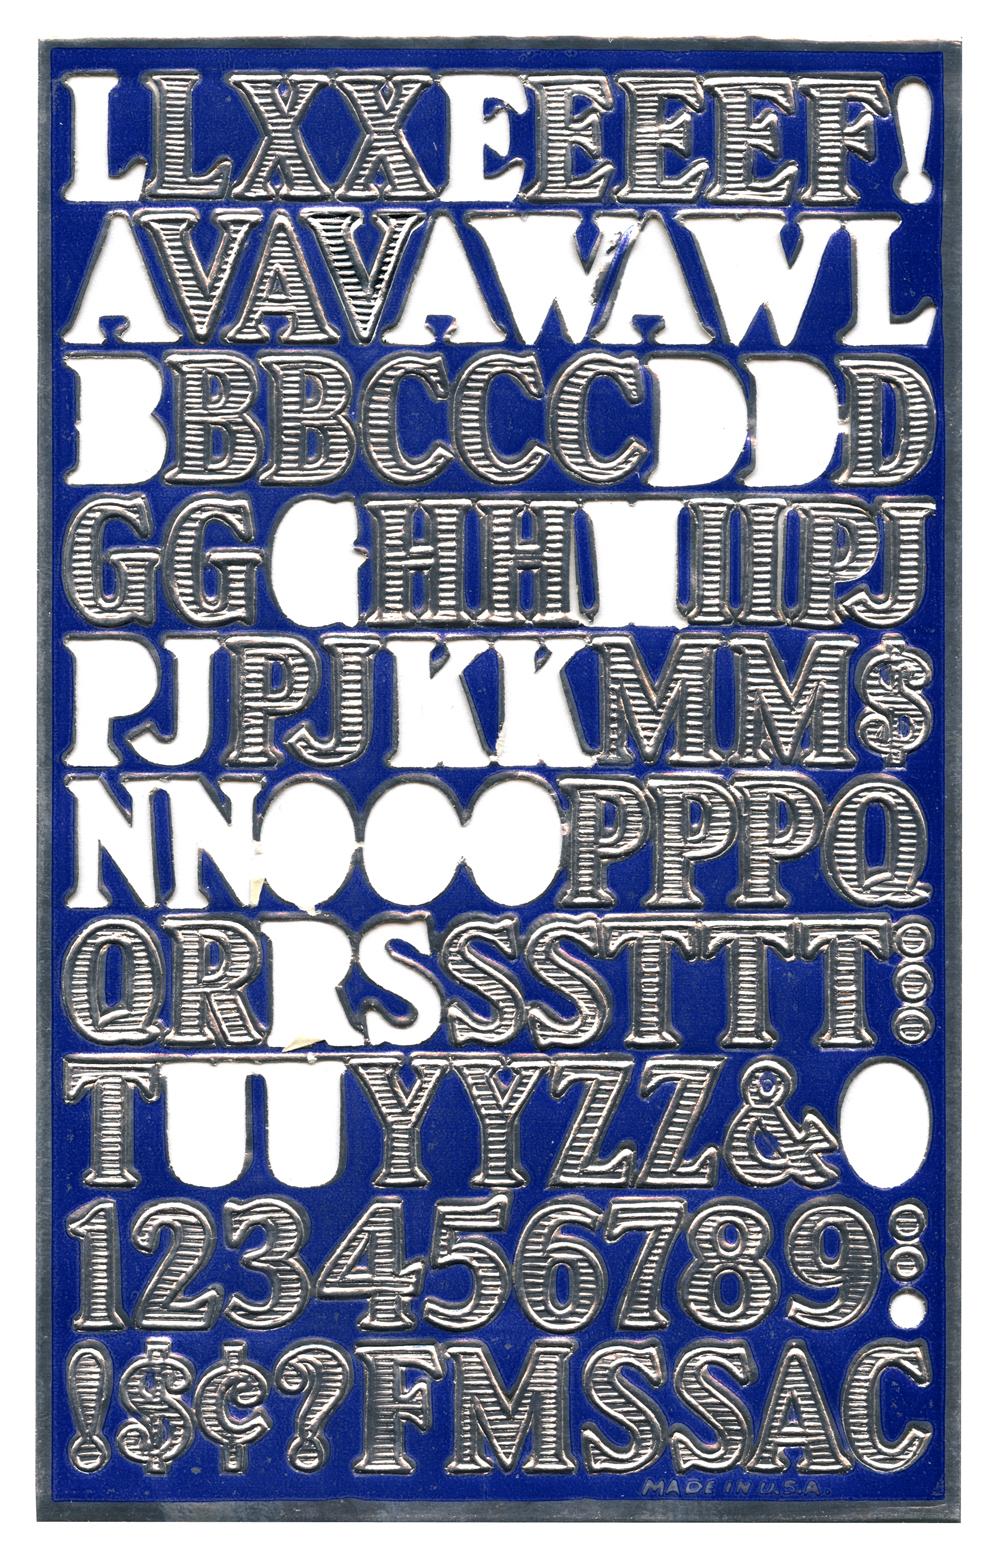 anagram_silver_letters_b_web.jpg